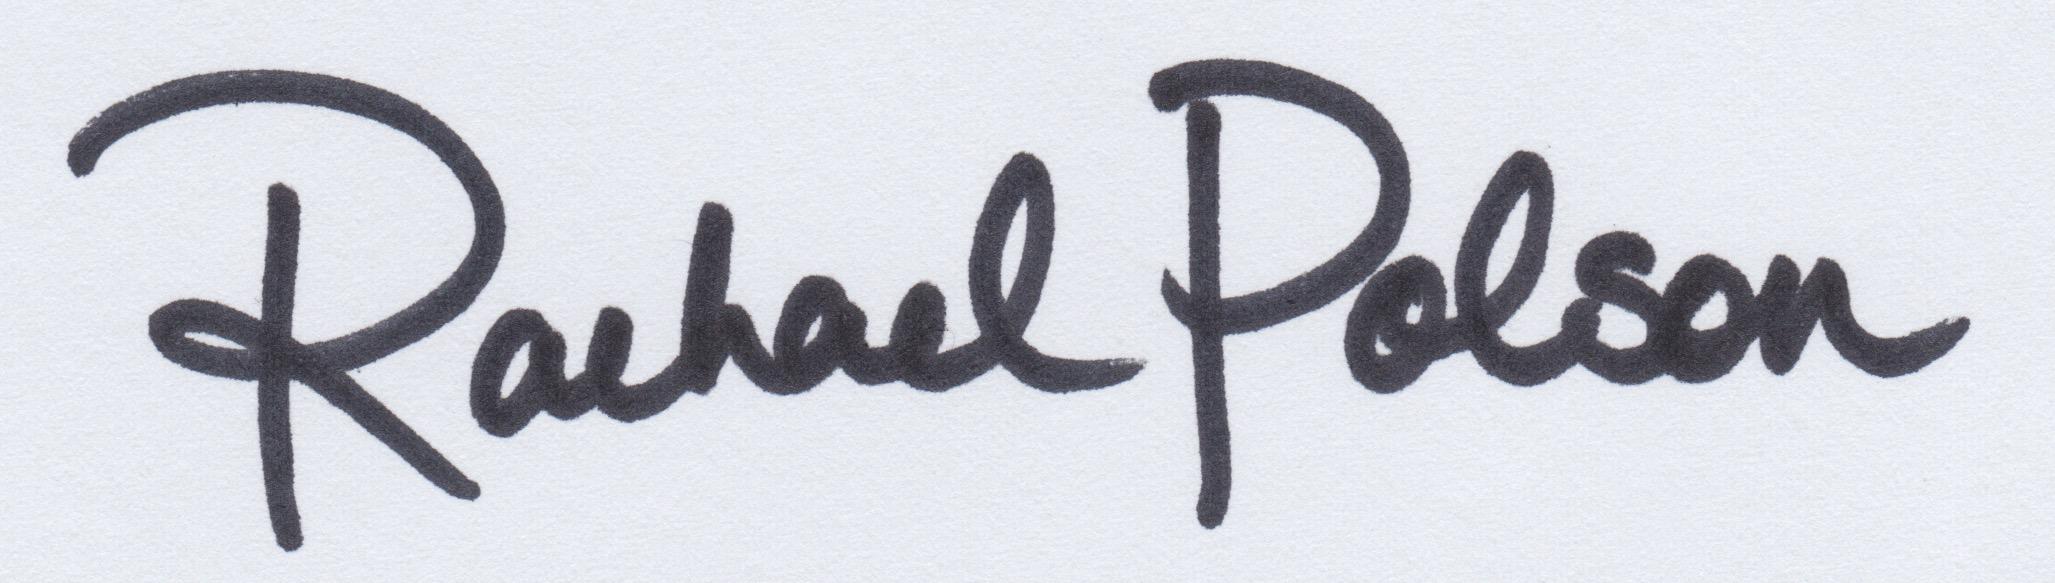 Rachael Polson Signature